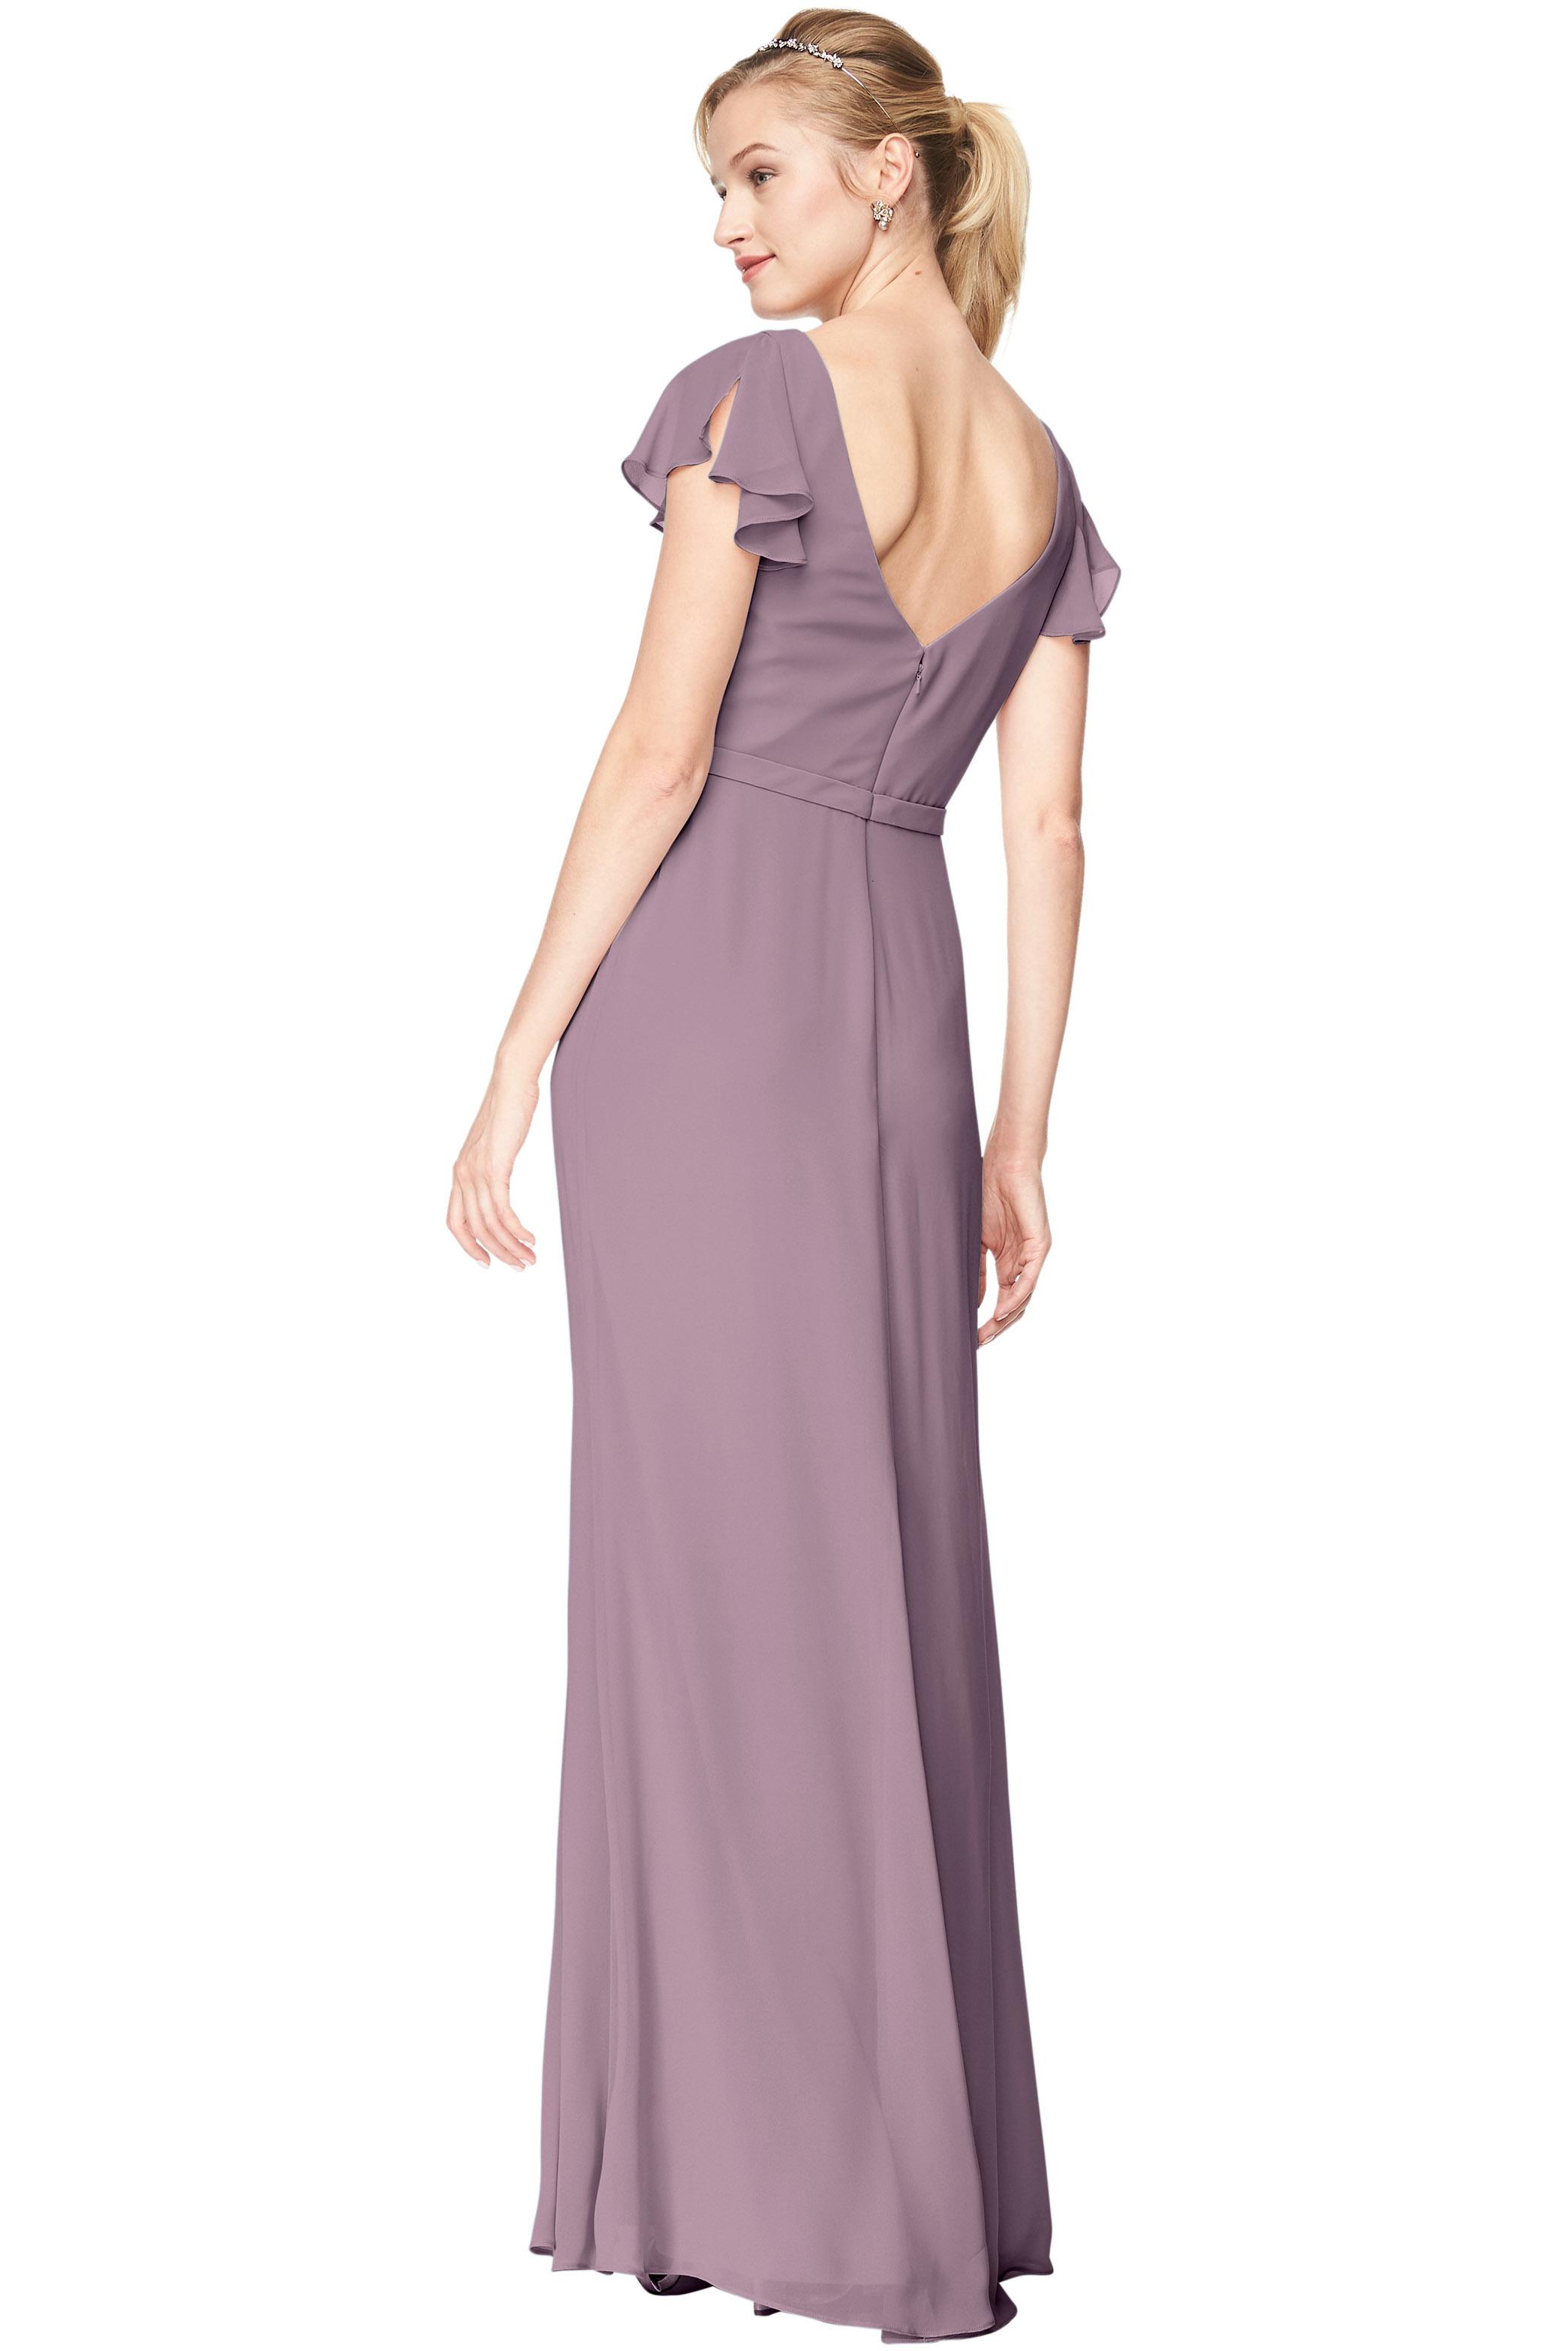 Bill Levkoff HEATHER Chiffon V-Neck A-Line gown, $184.00 Back